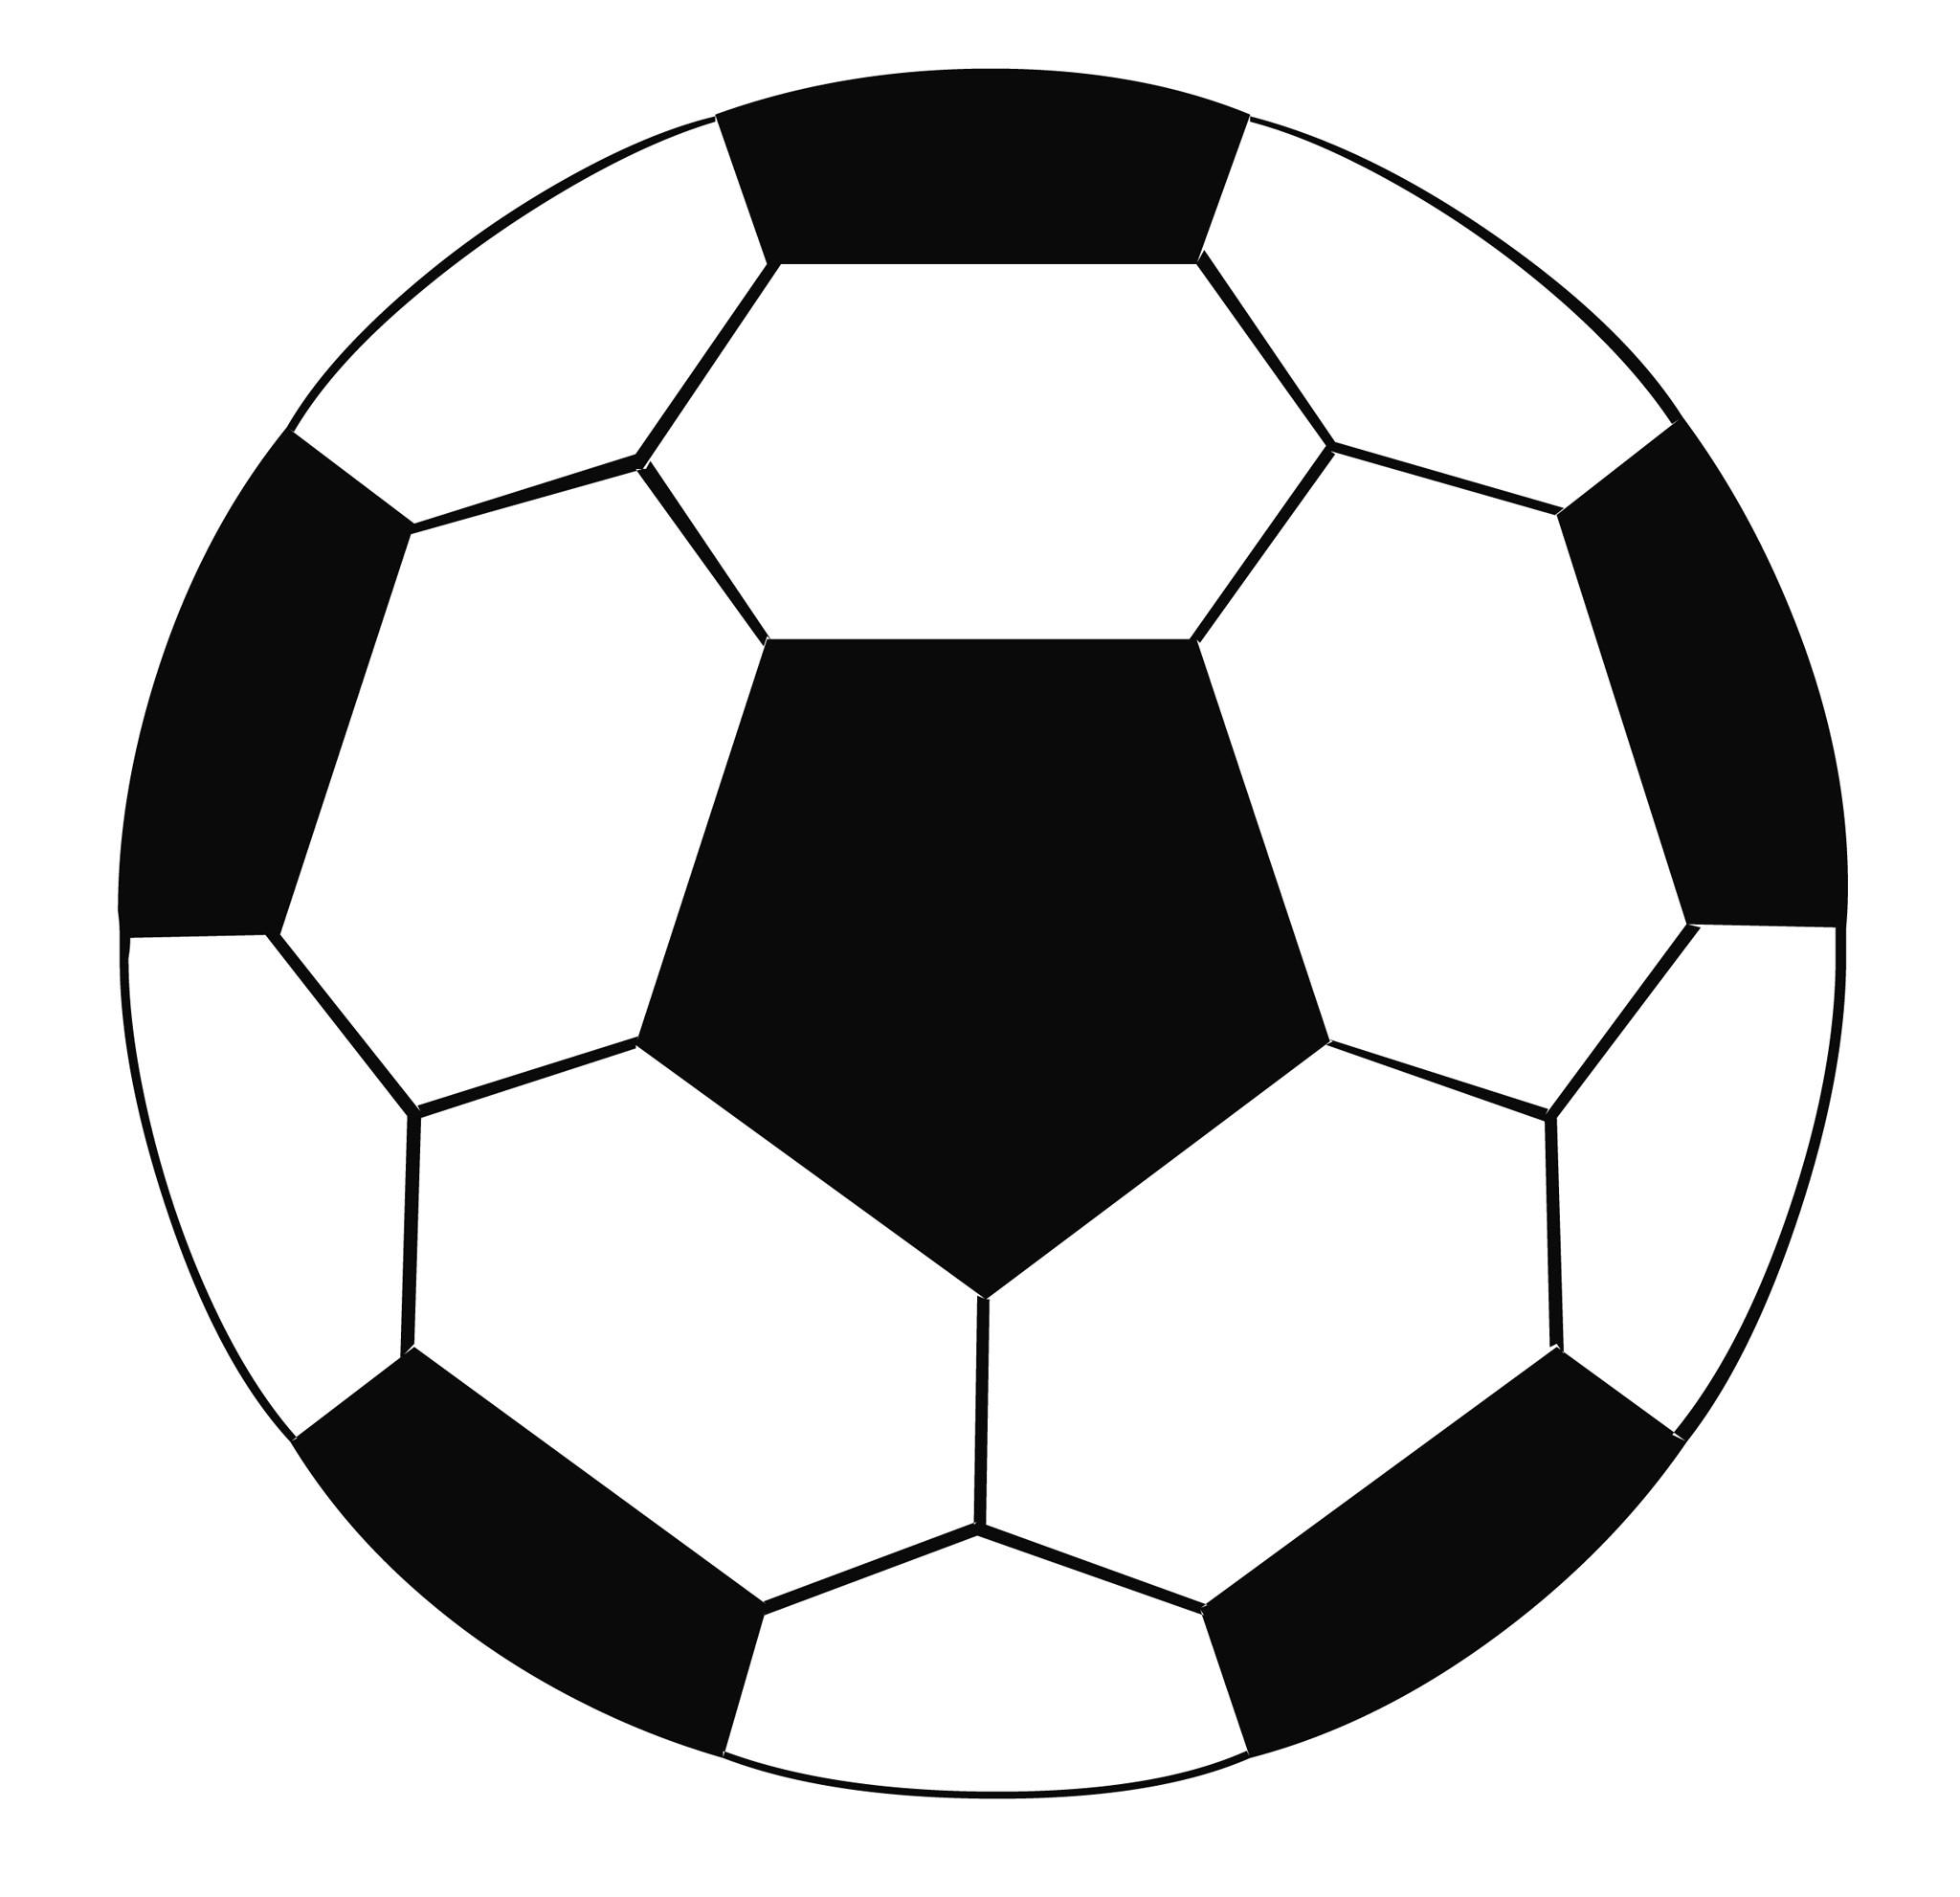 Simple clipart soccer ball Ball Clip soccer soccer Free